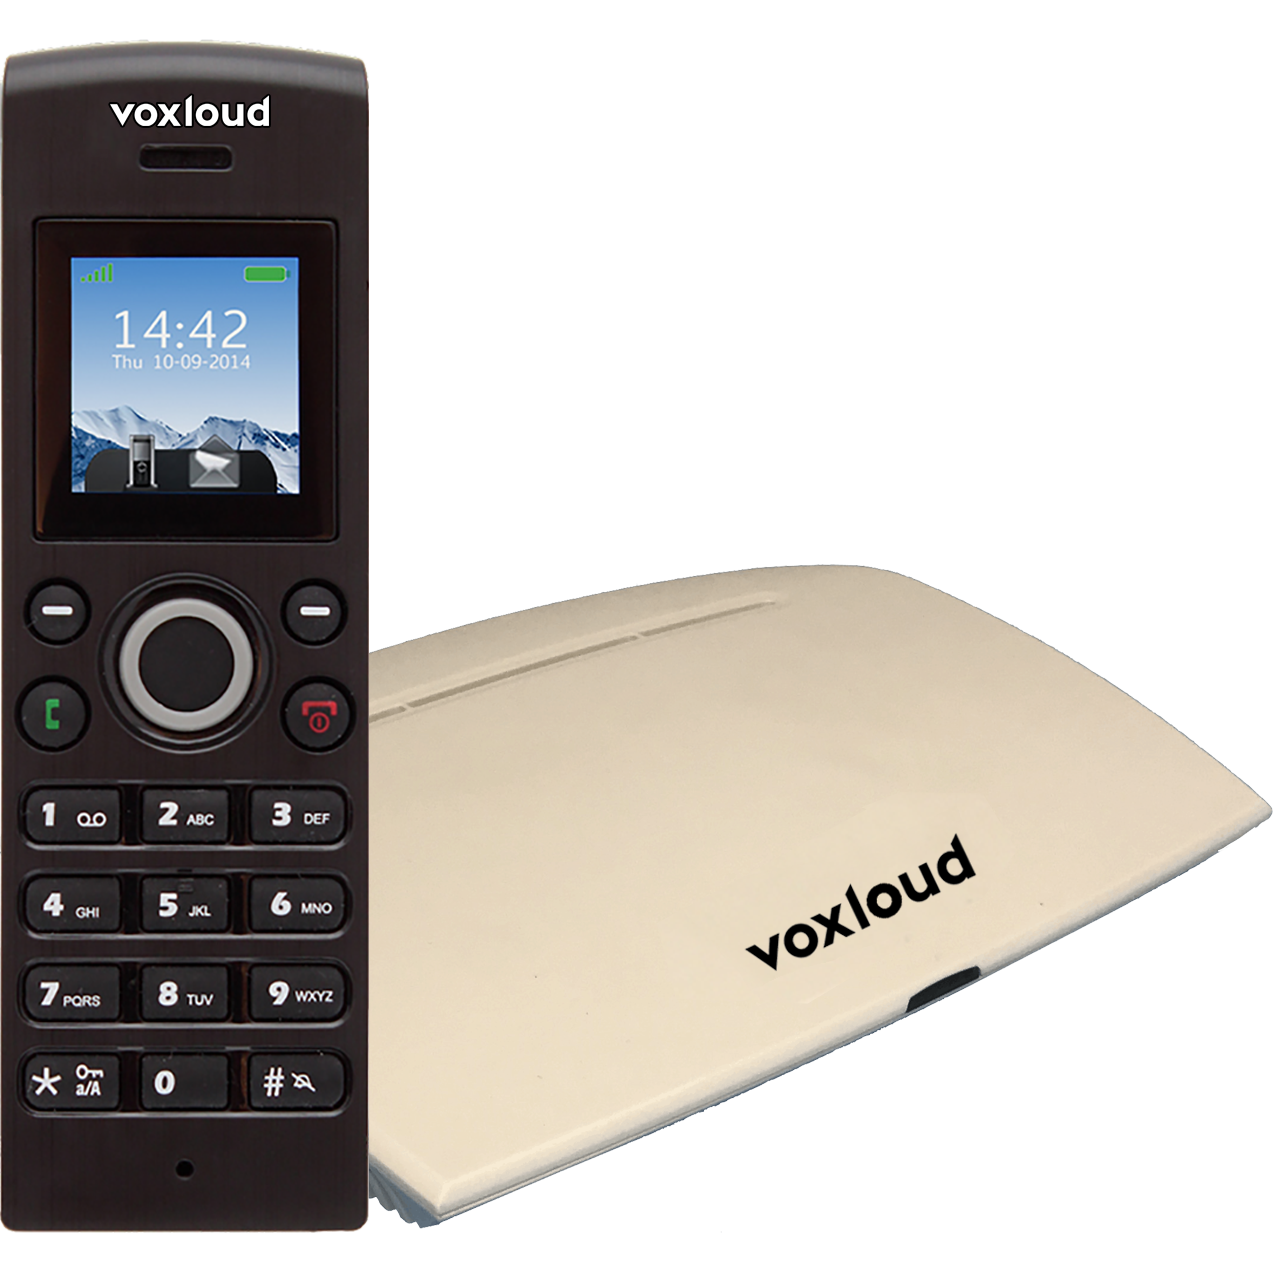 voxloud phone-air-base-cordless-new